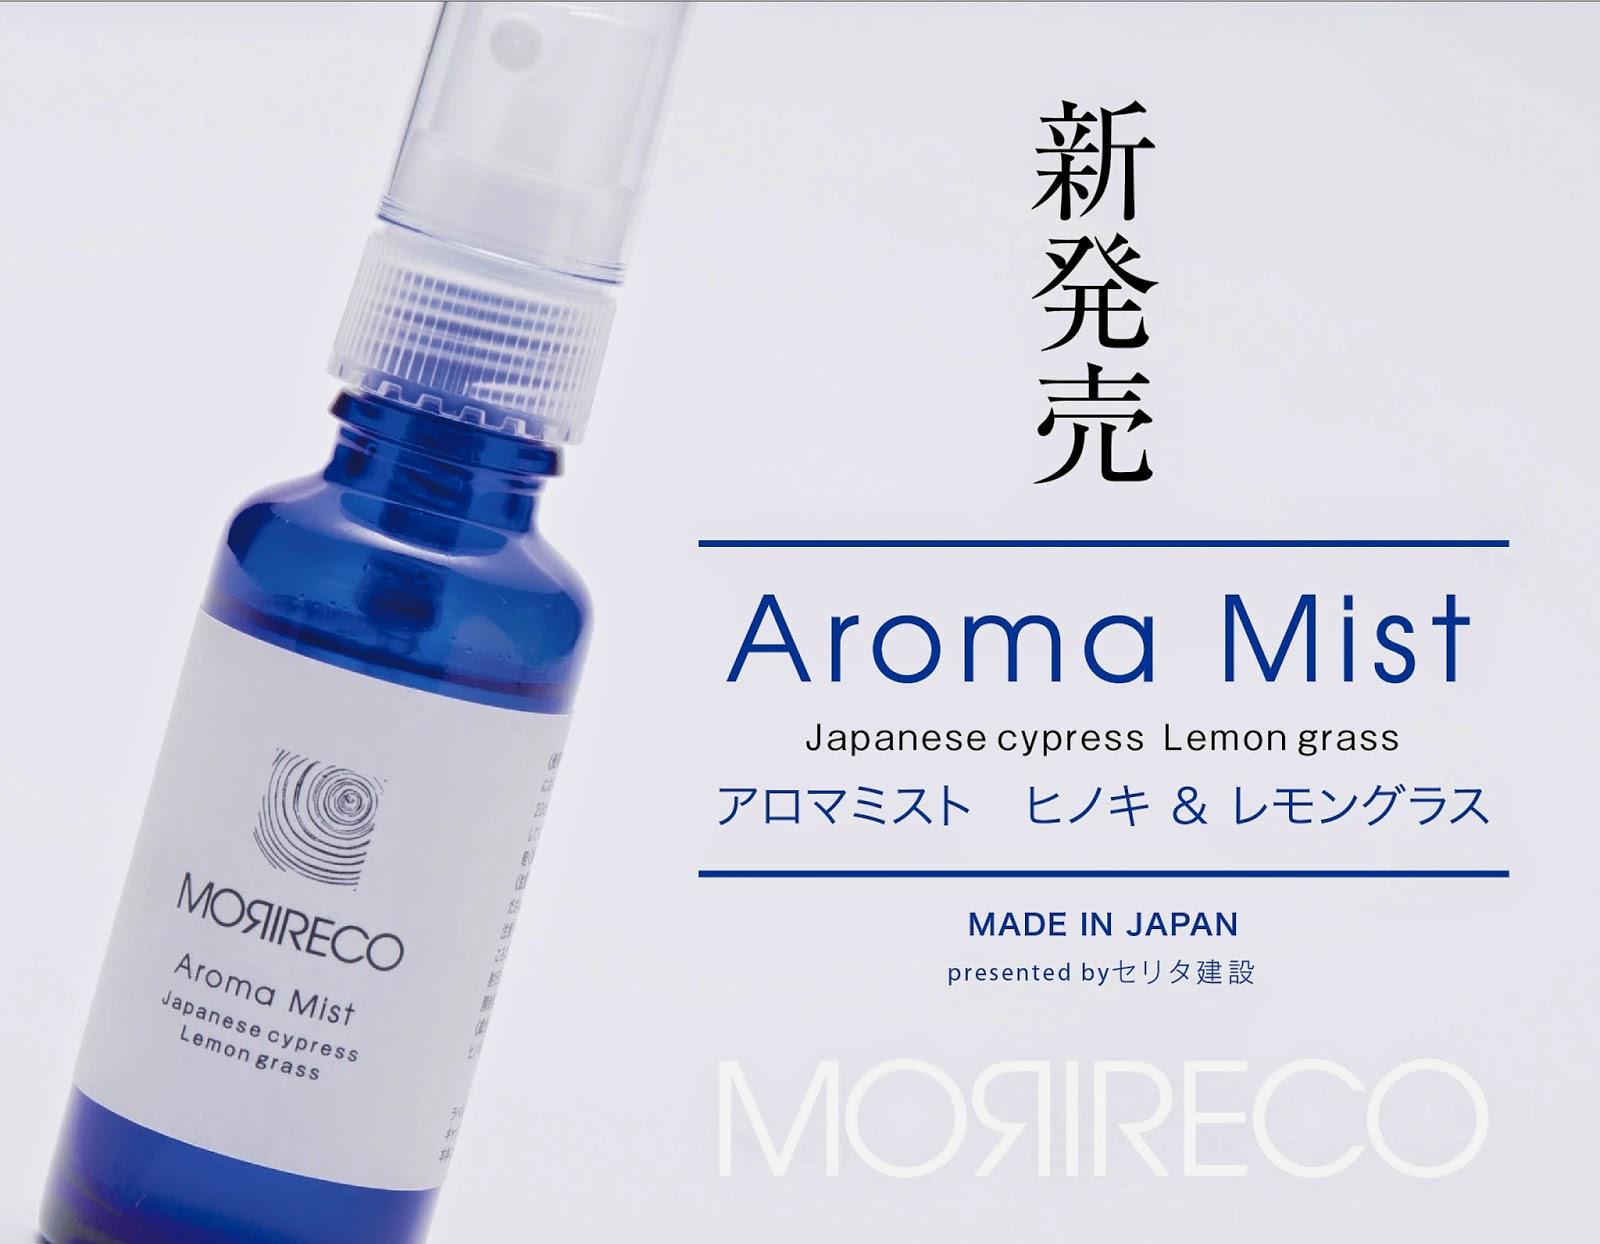 [MORIRECO] 新商品「アロマミスト」発売!